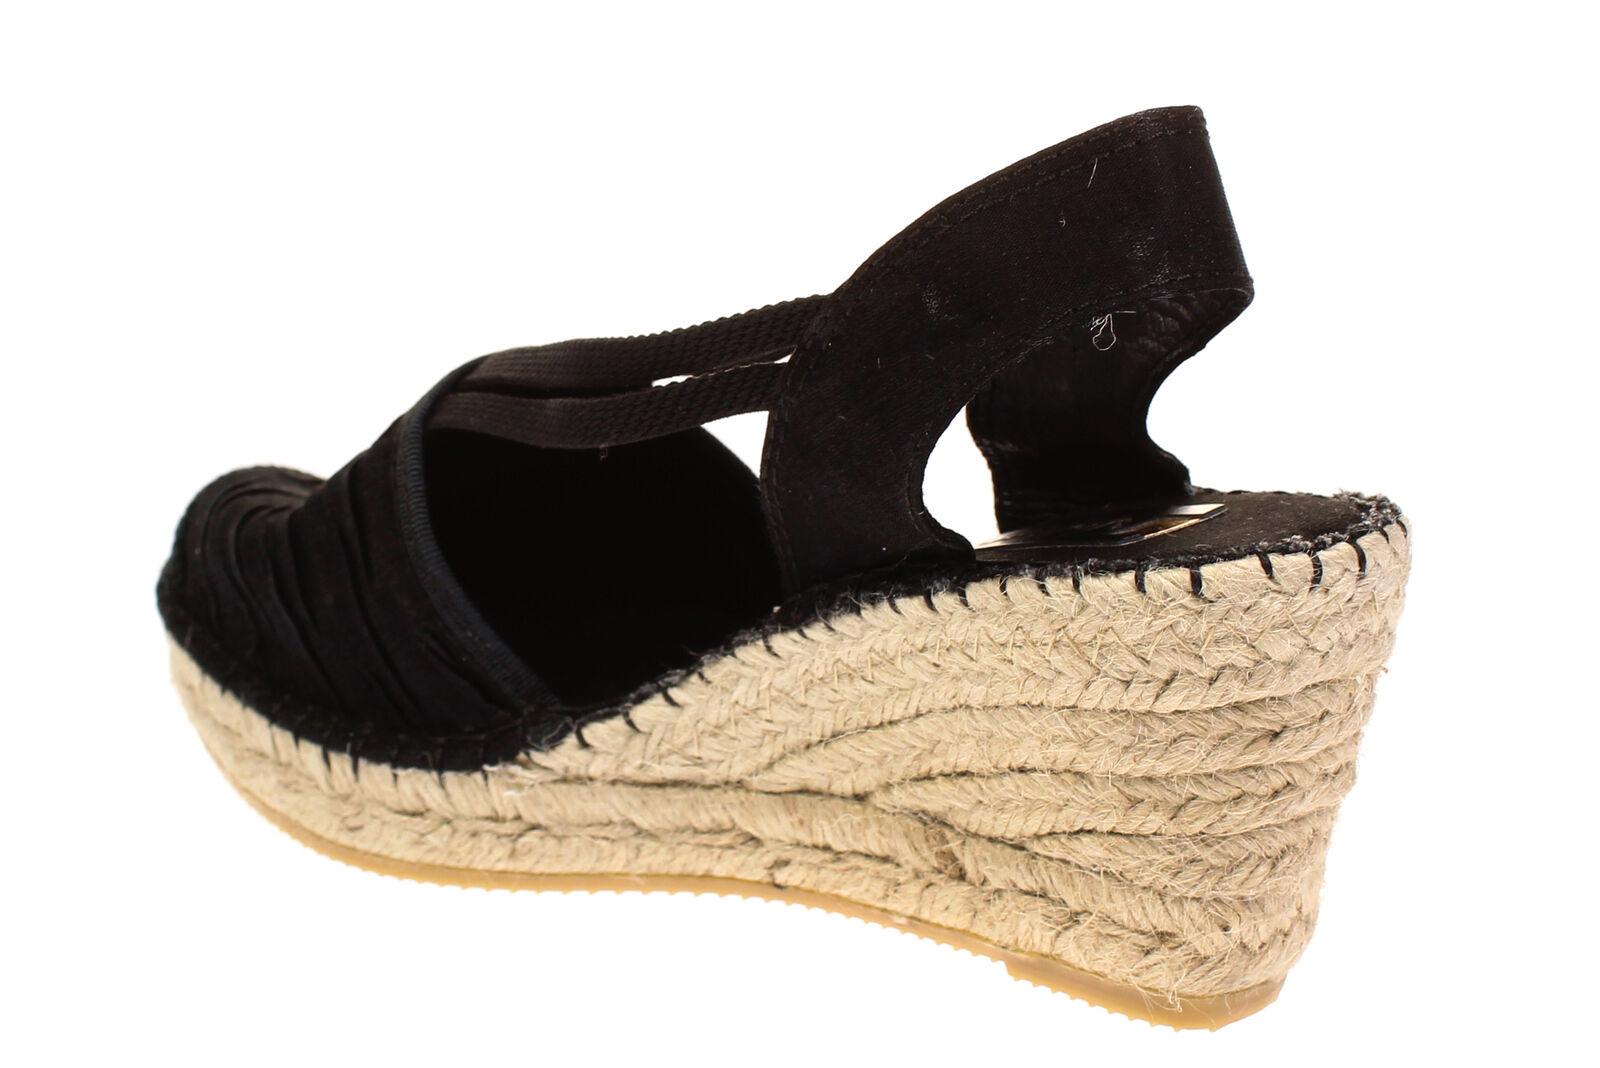 18c72b3c812d14 Vidoretta 18400-SEÑORA zapatos sandalias de cuña zapatos casual-estrella  negra e44243 - classics-cabriolets.com.es